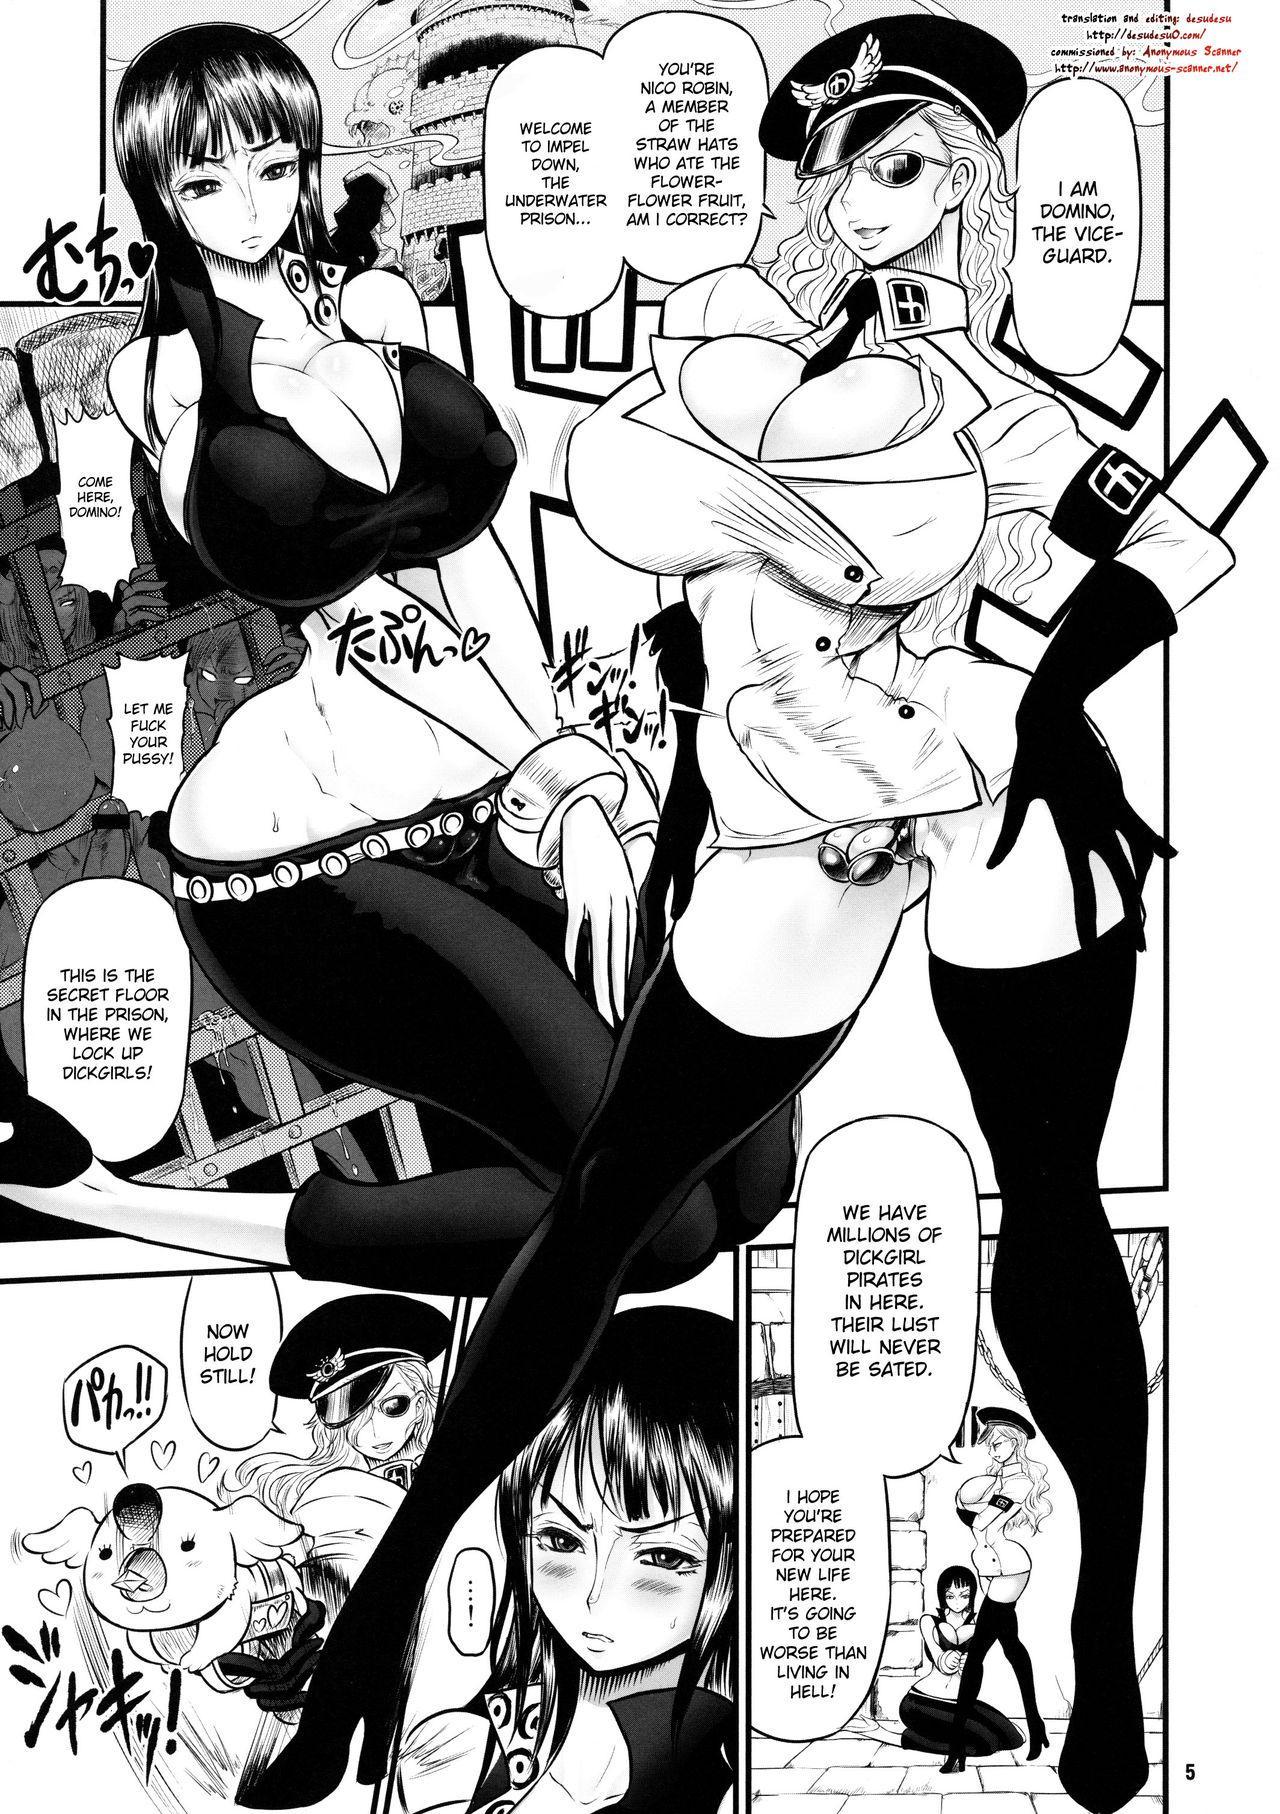 Midare Saki Joshuu Kaizoku Soushuuhen   Bloom, Pirate Hooker! Bloom! Annual 6